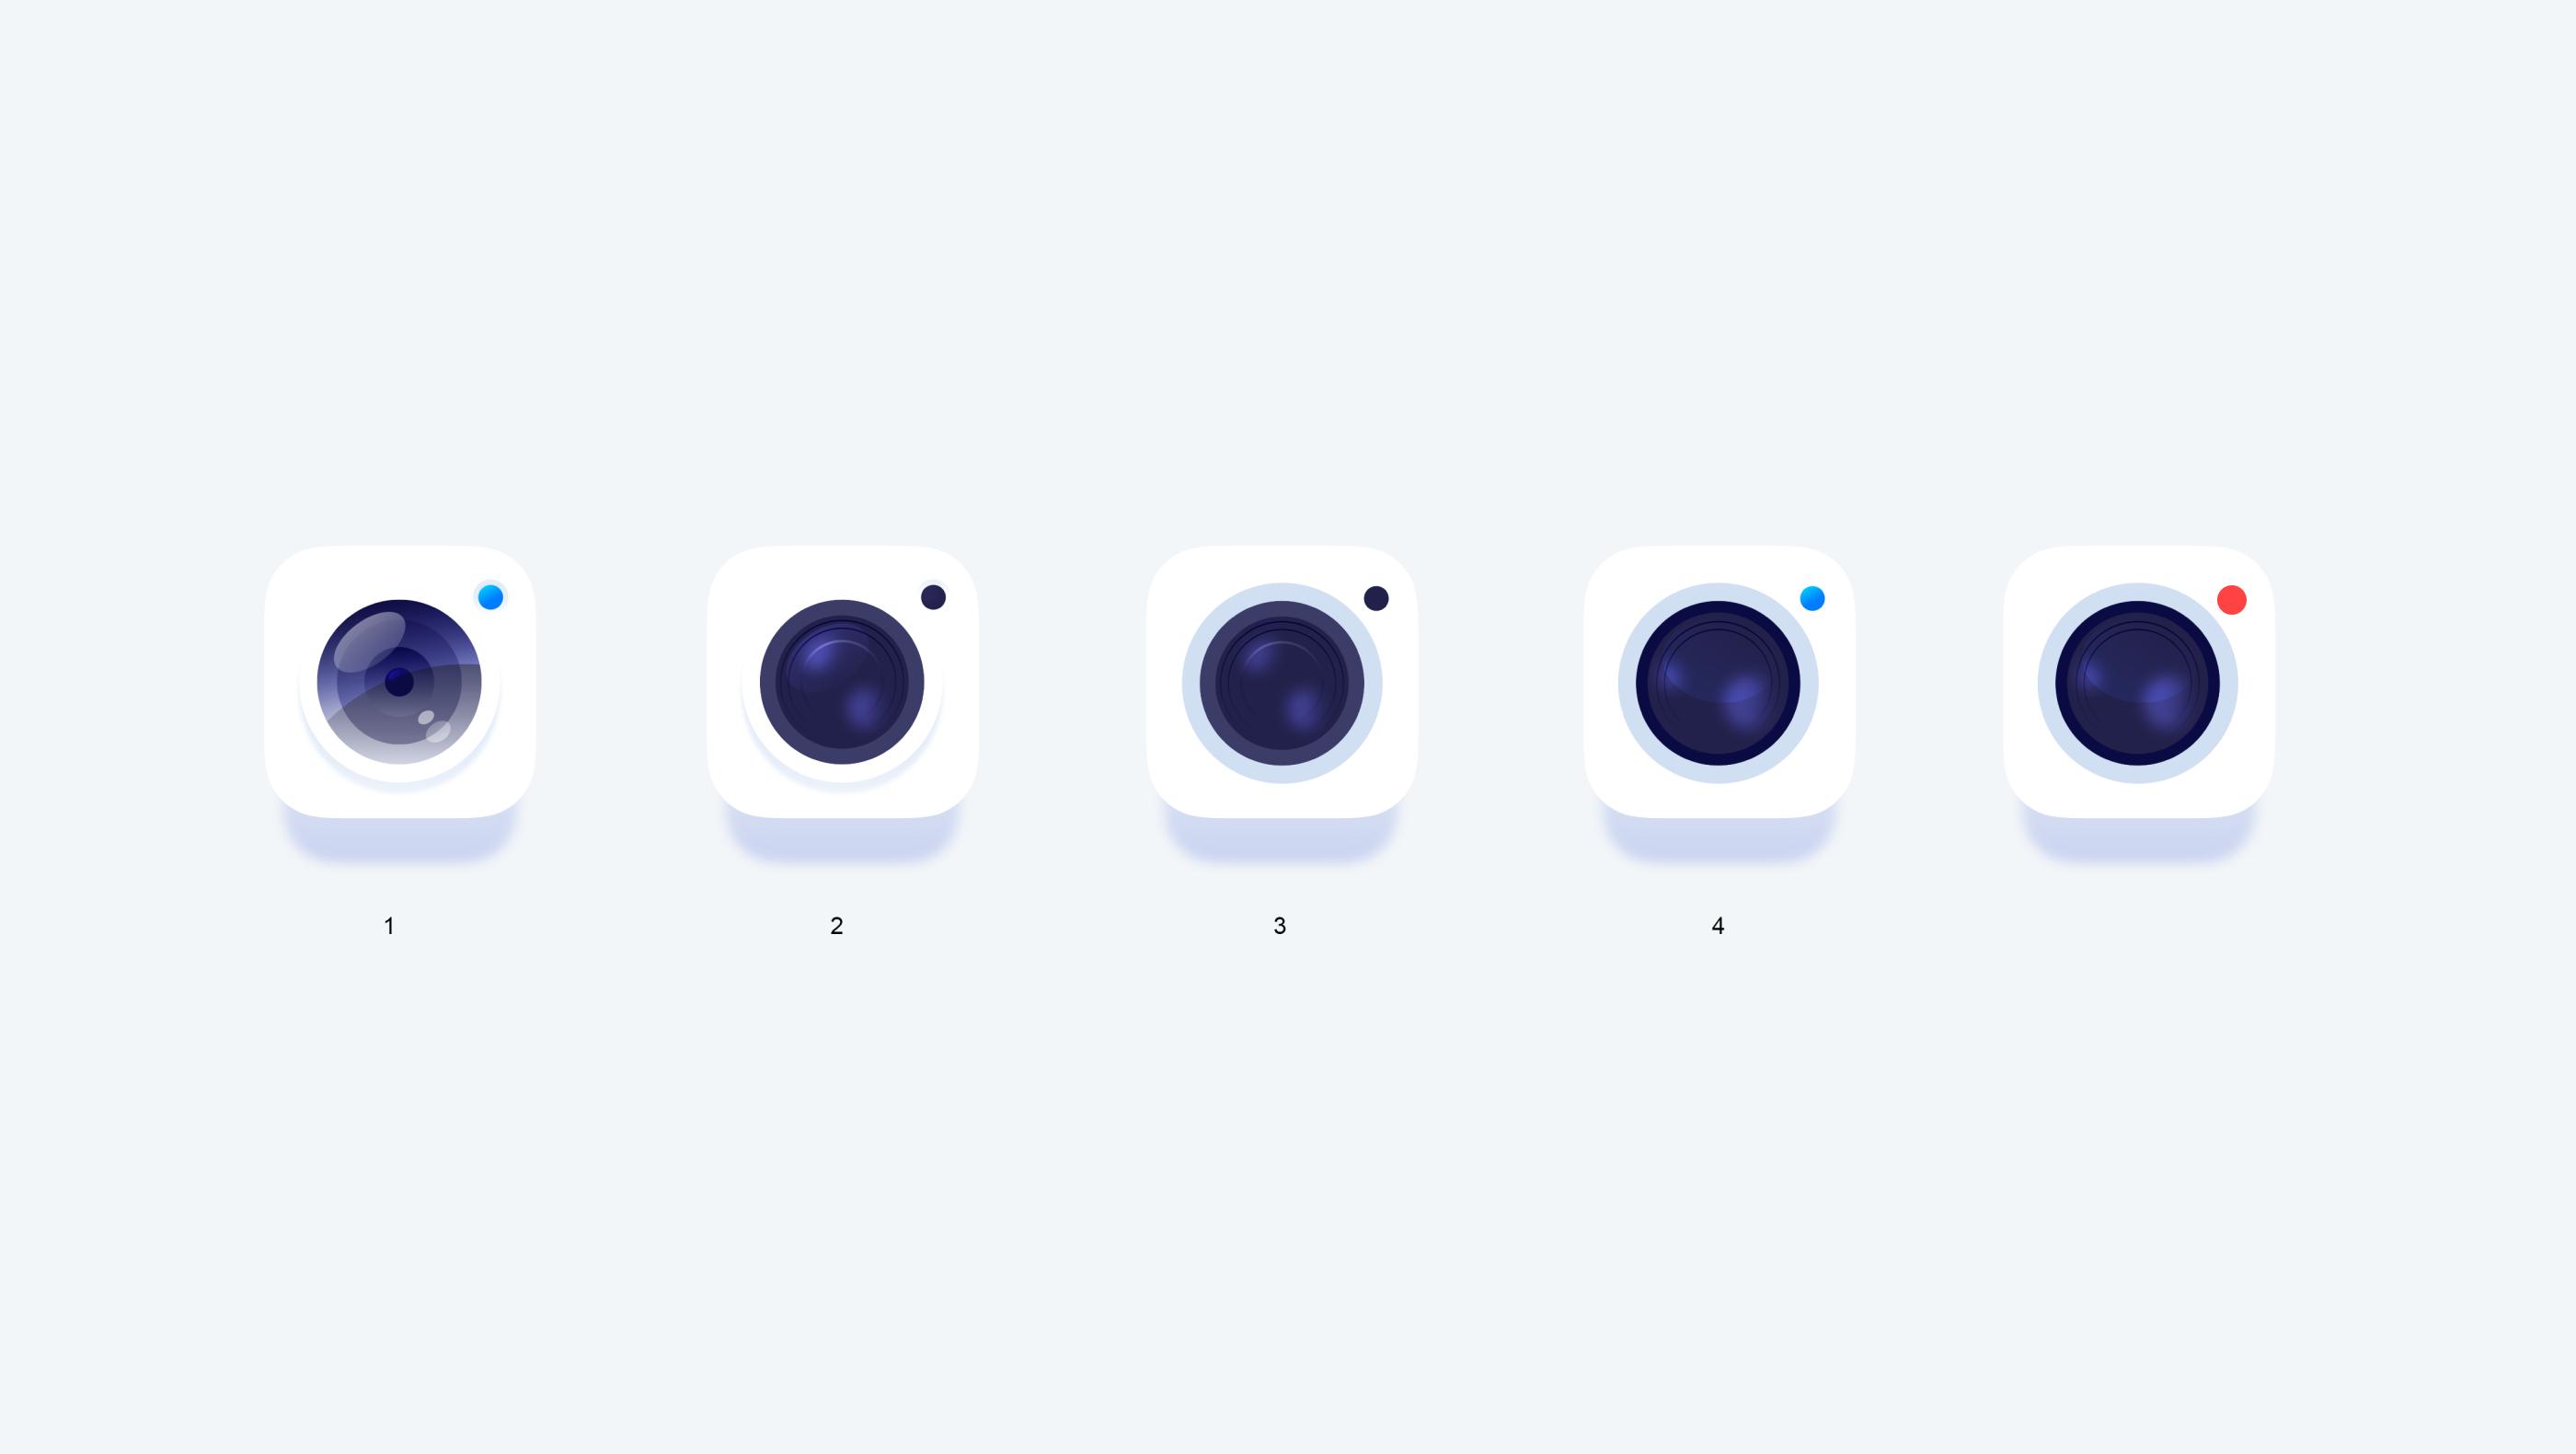 HUAWEI_EMUI_icons_camera icon